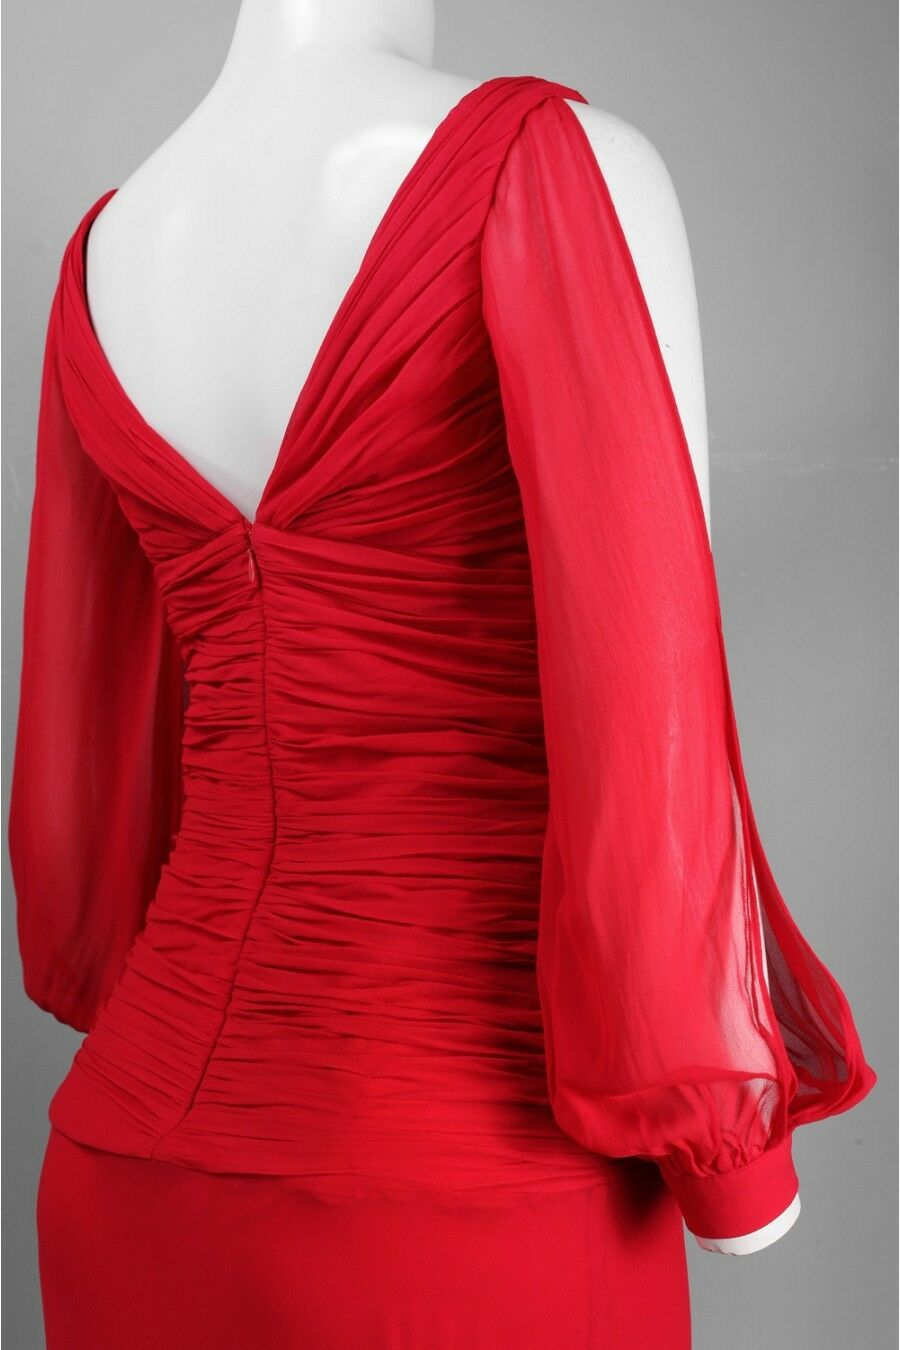 Nina Nina Nina Austin Size XS Women's Puff Slit Sleeve Red Dress Gown NWT NEW 0d98cf